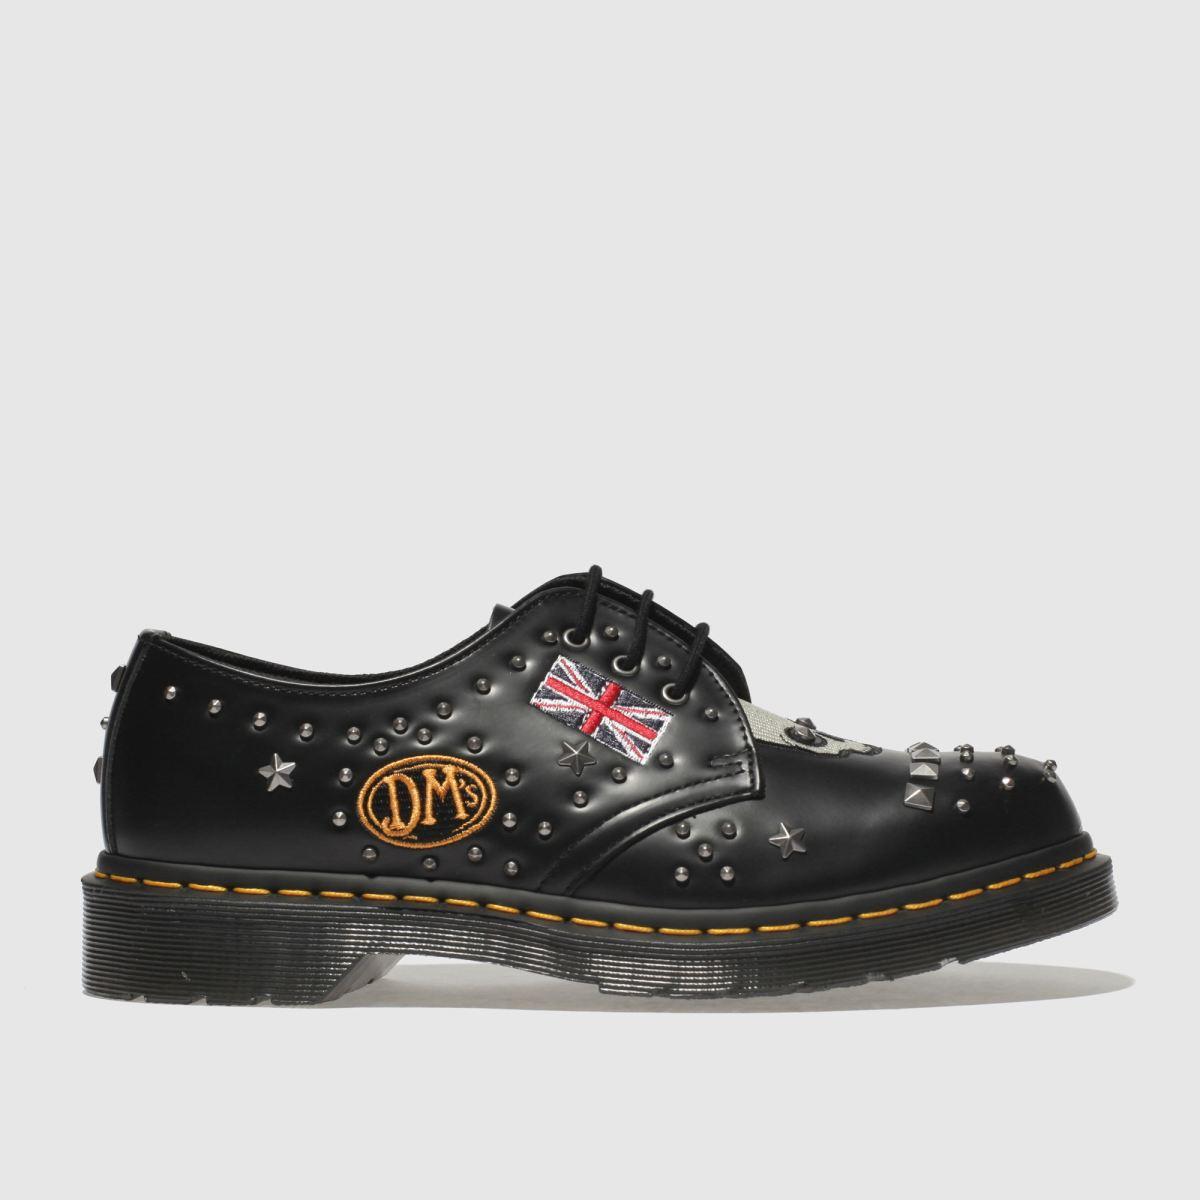 Dr Martens Black 1461 Rockabilly Shoes